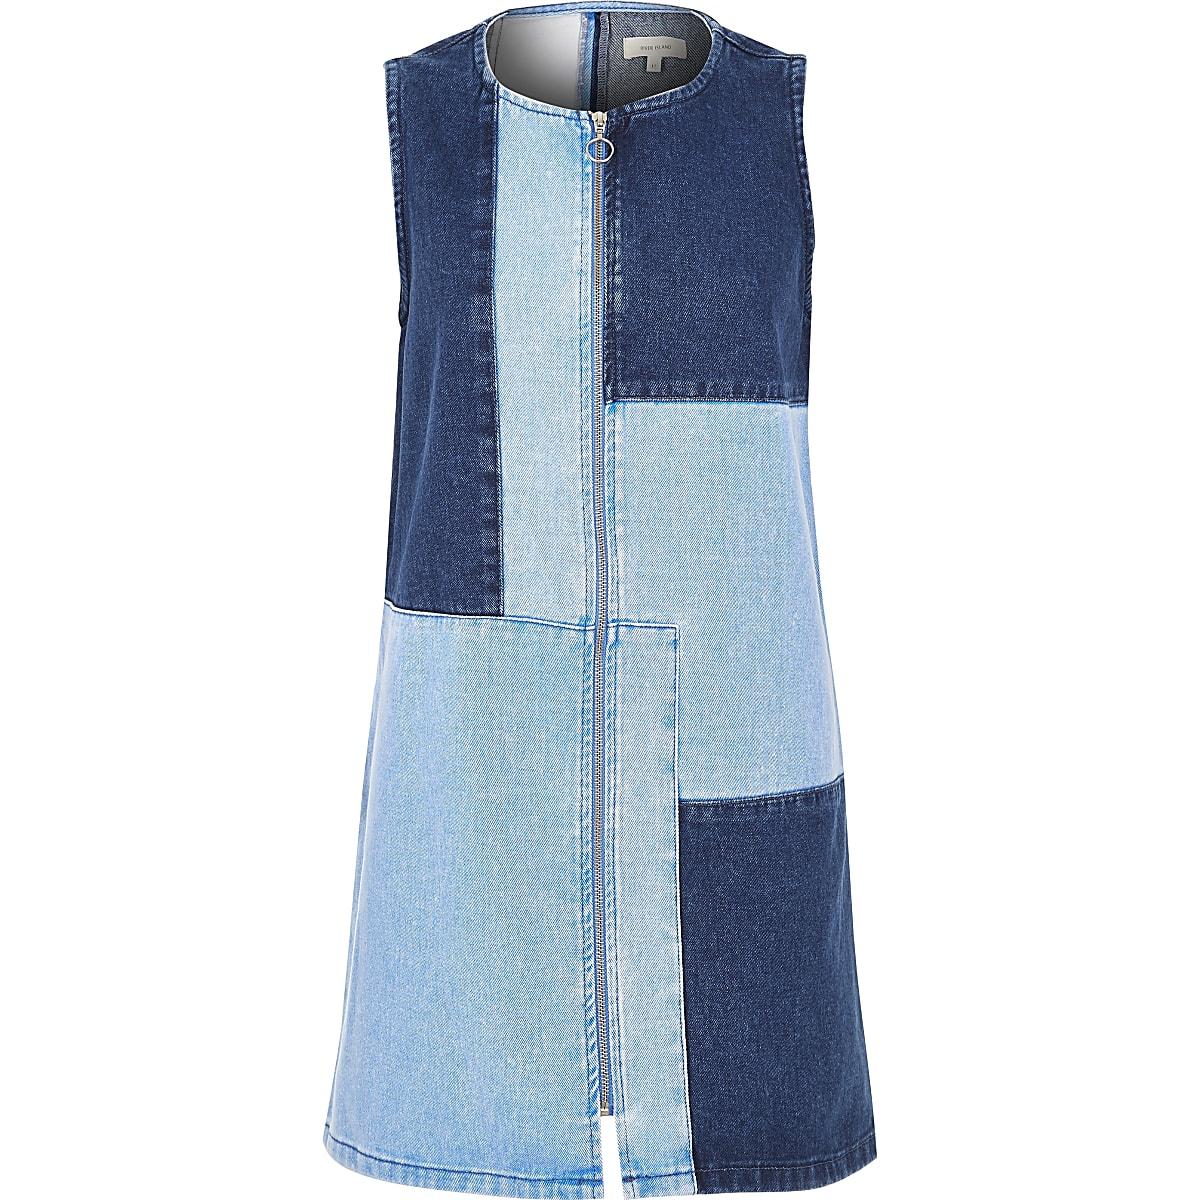 100% authentic 05ab0 e0c7e Blue patchwork denim dress